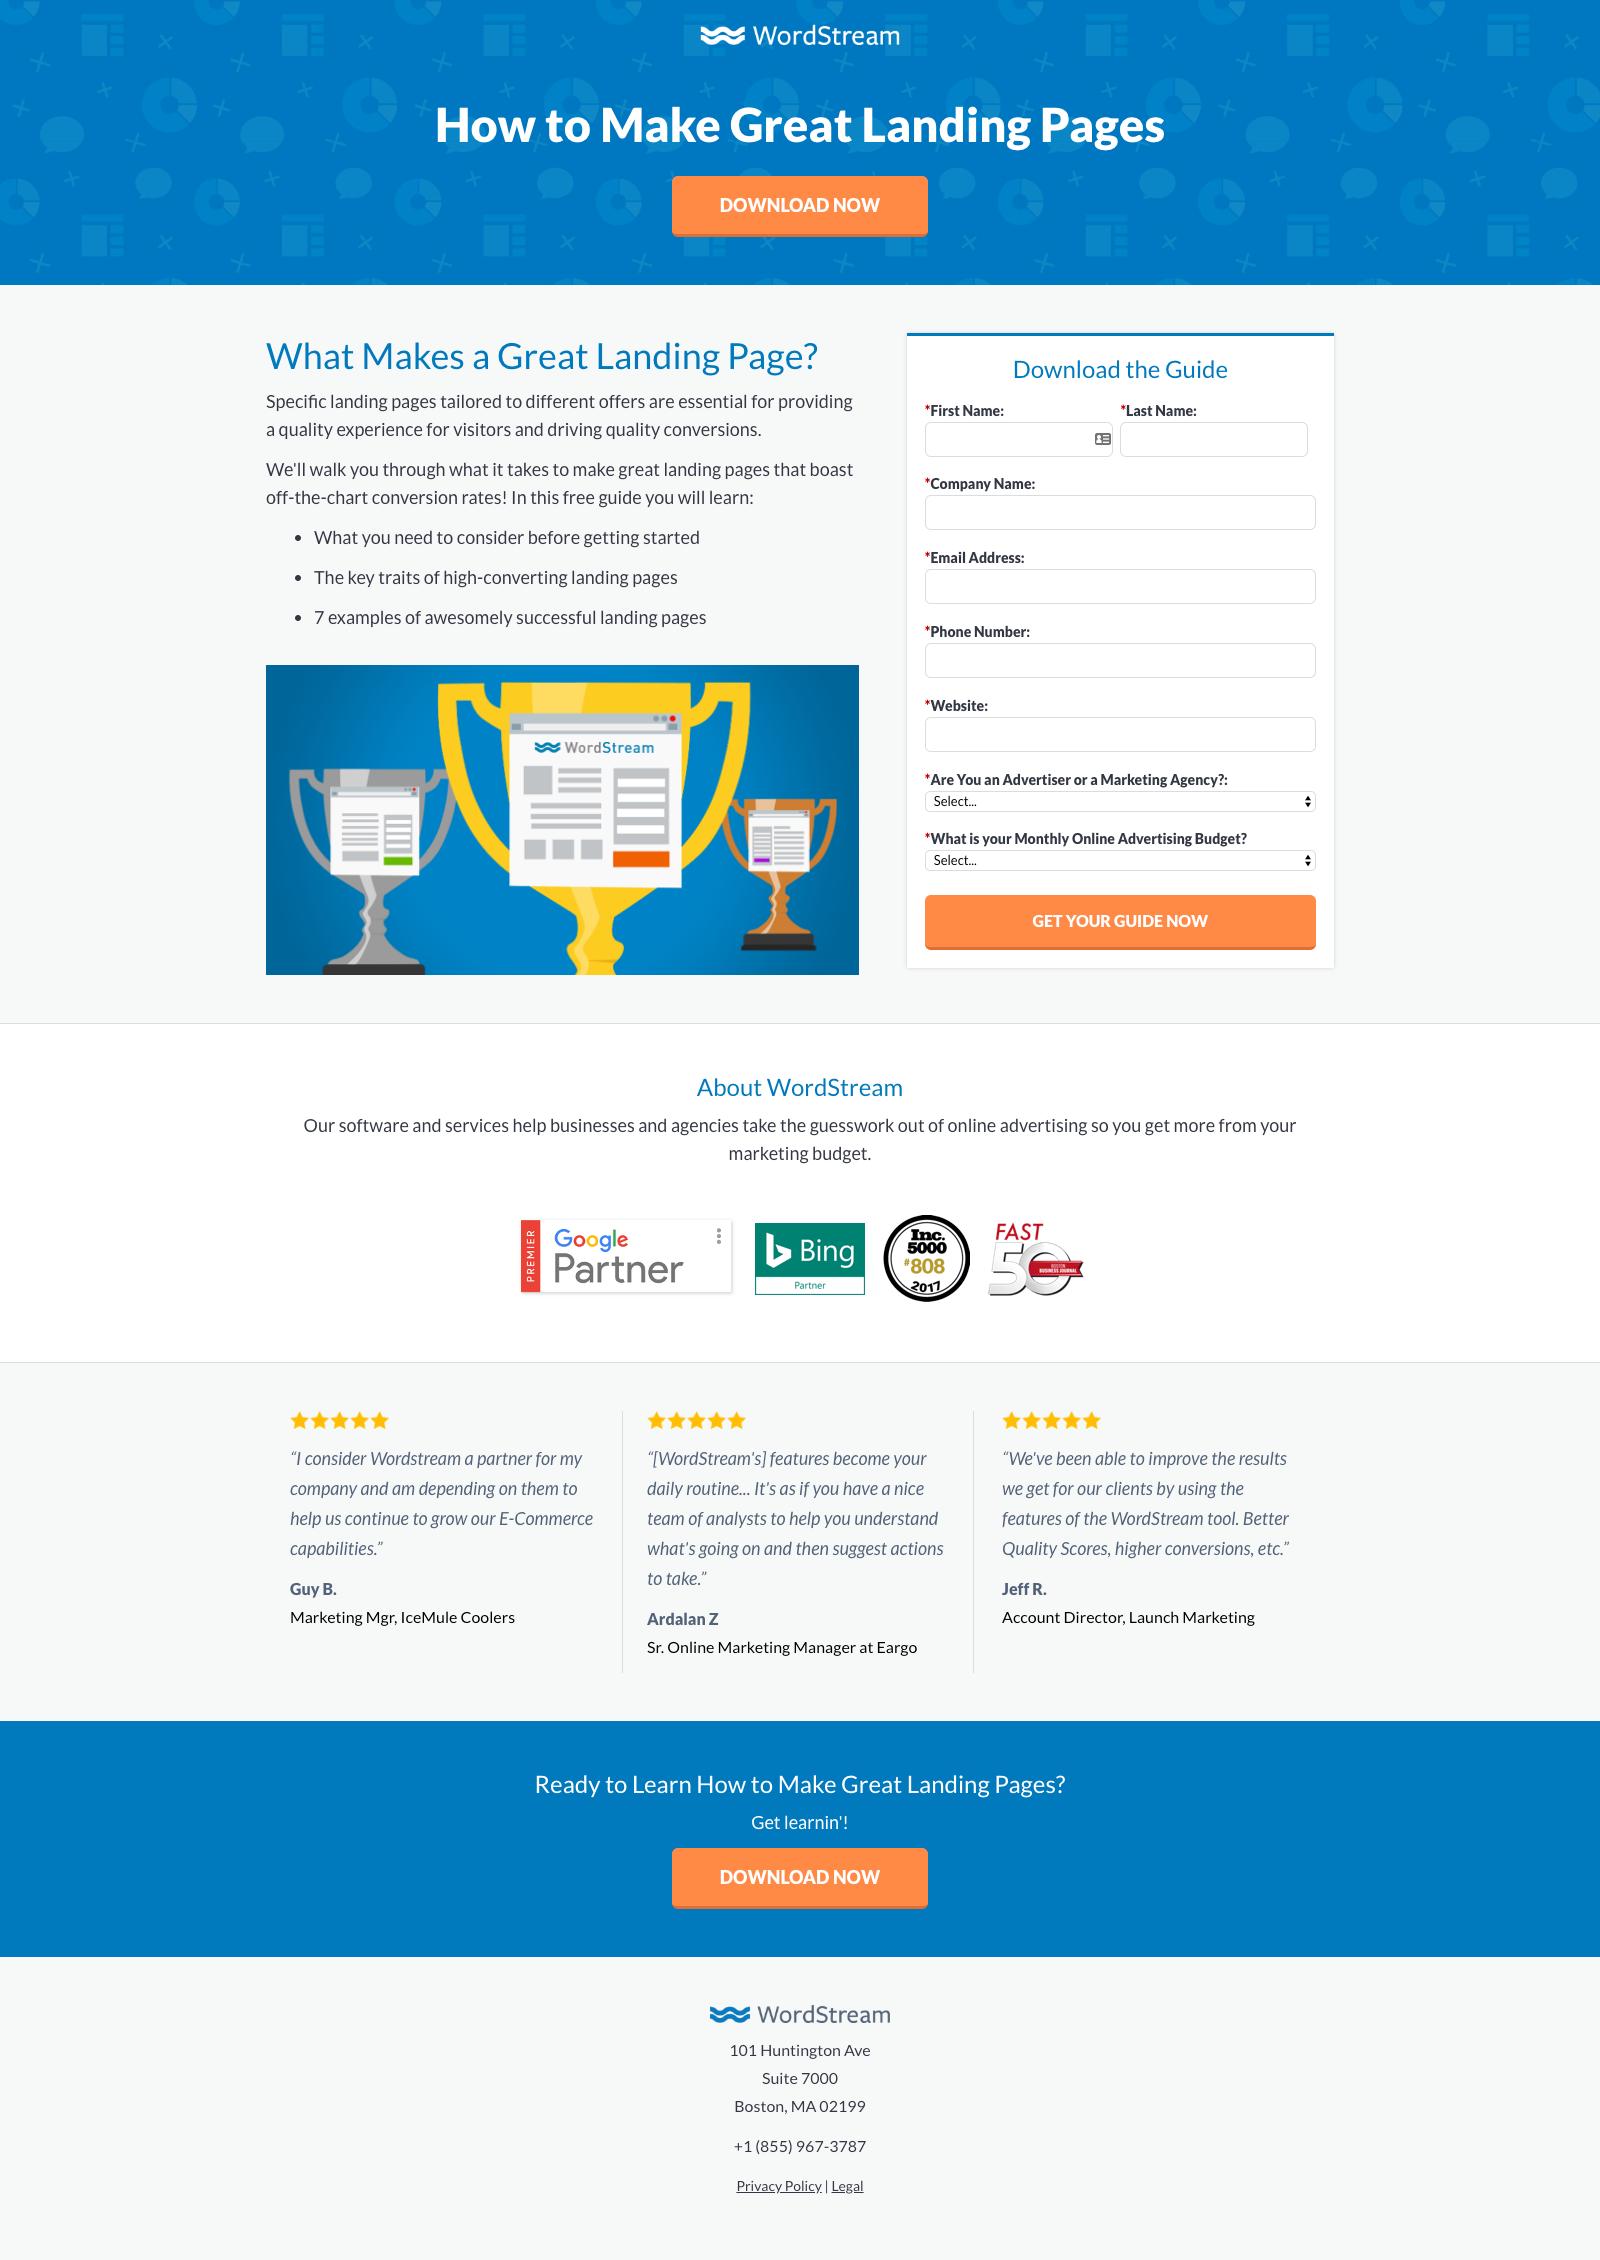 screencapture-marketing-wordstream-WSContentDLGGLPPCLandingPageGuide-html-2020-01-08-10_43_05